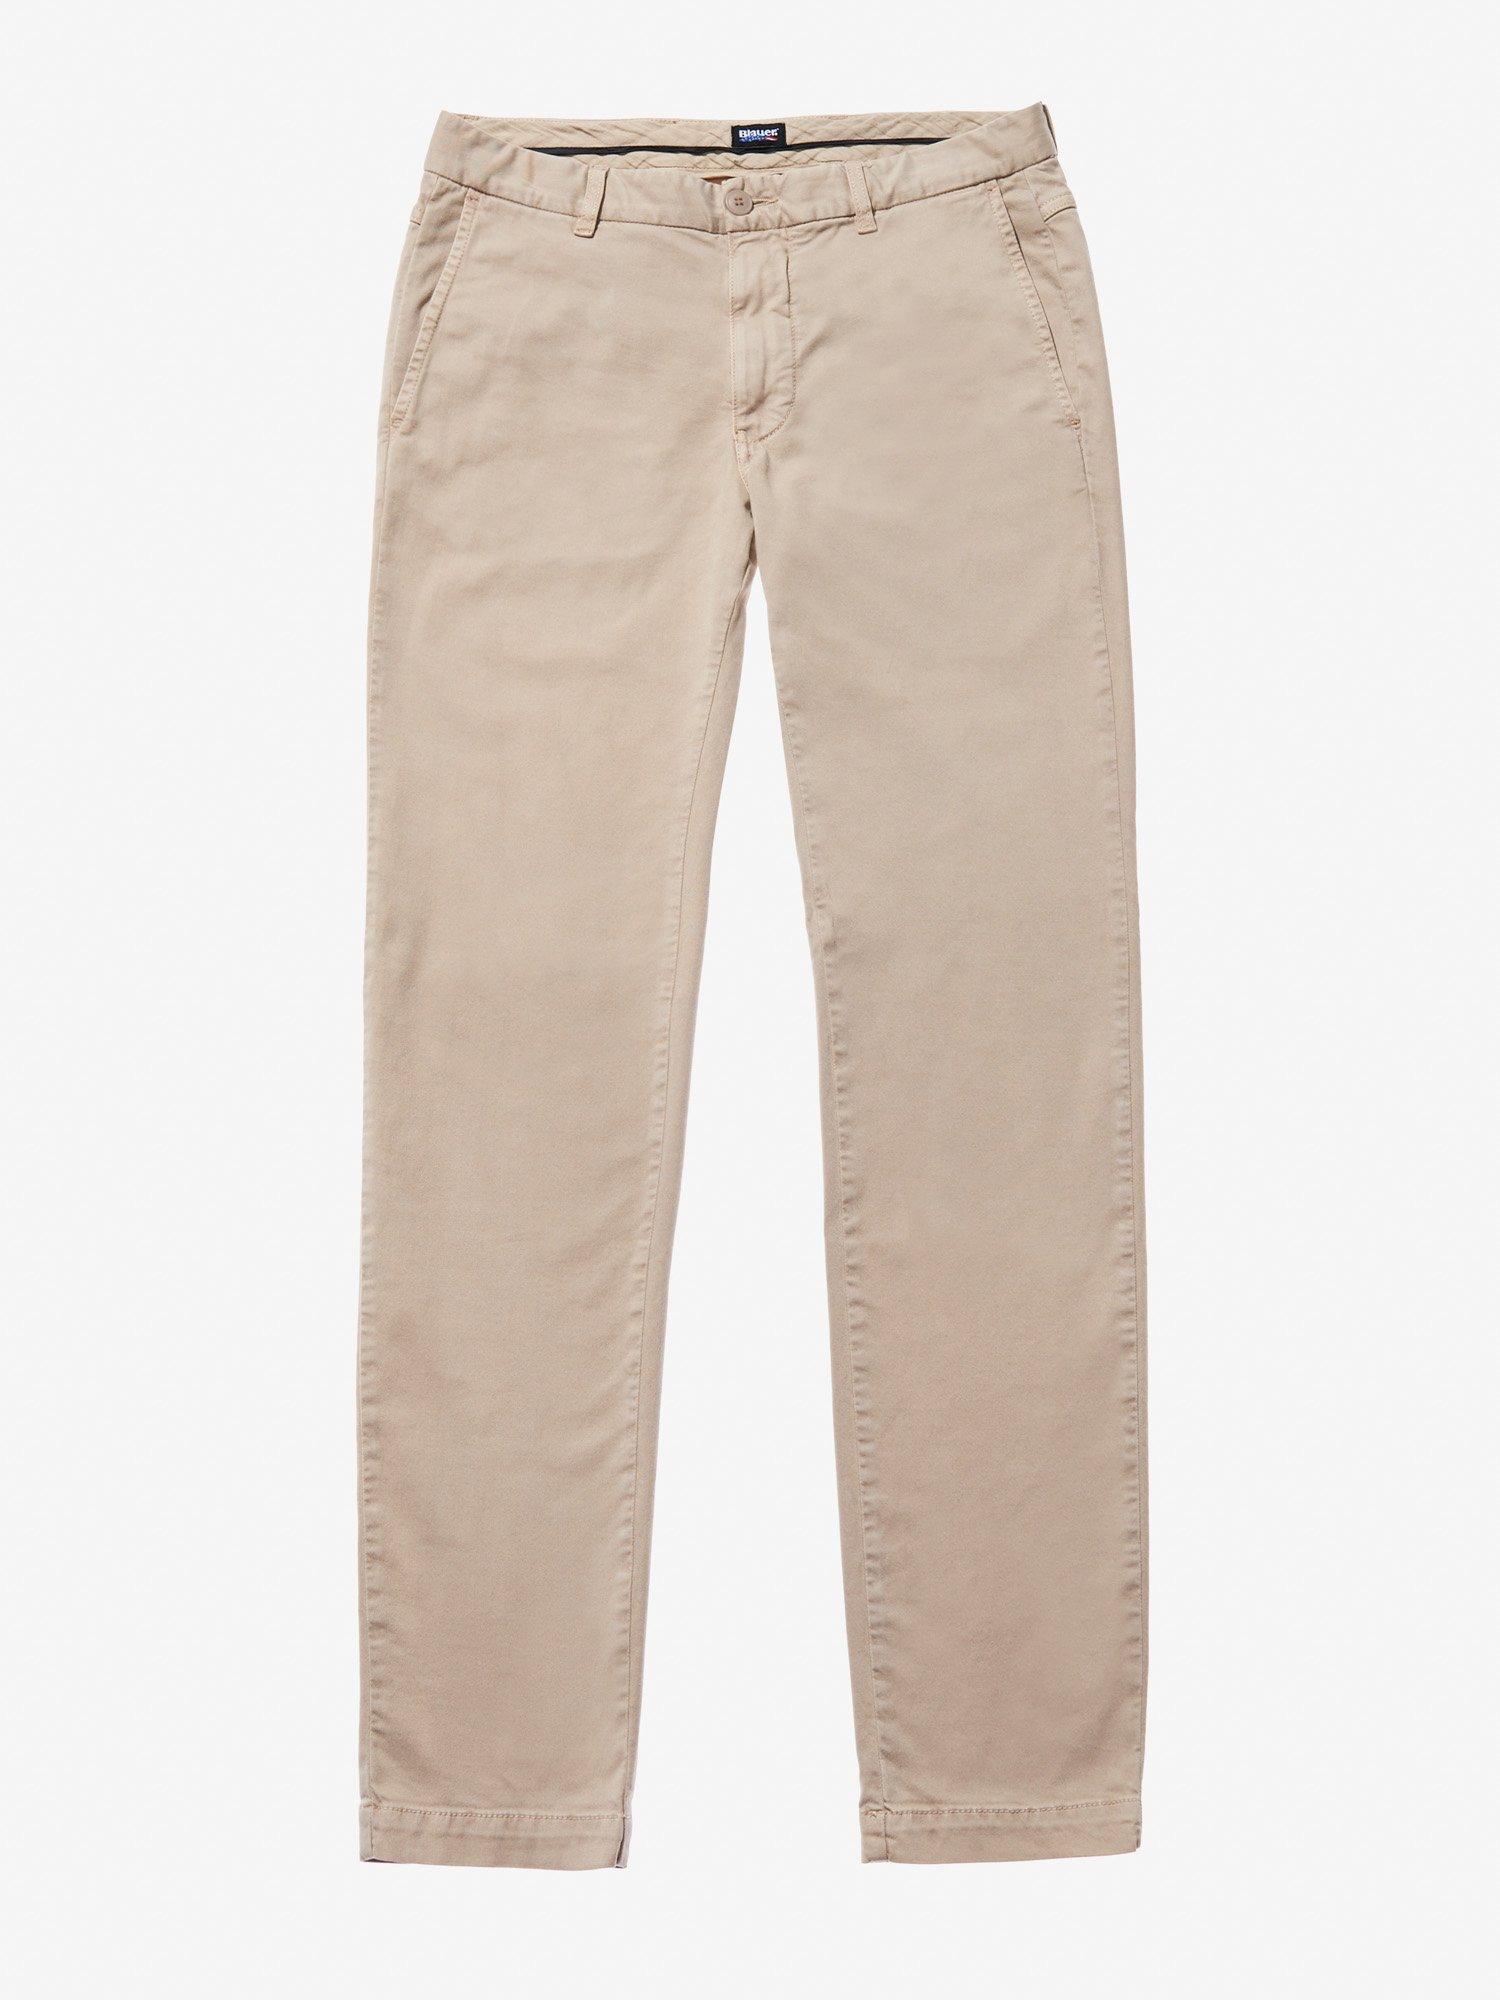 GARMENT DYED CHINO PANTS - Blauer